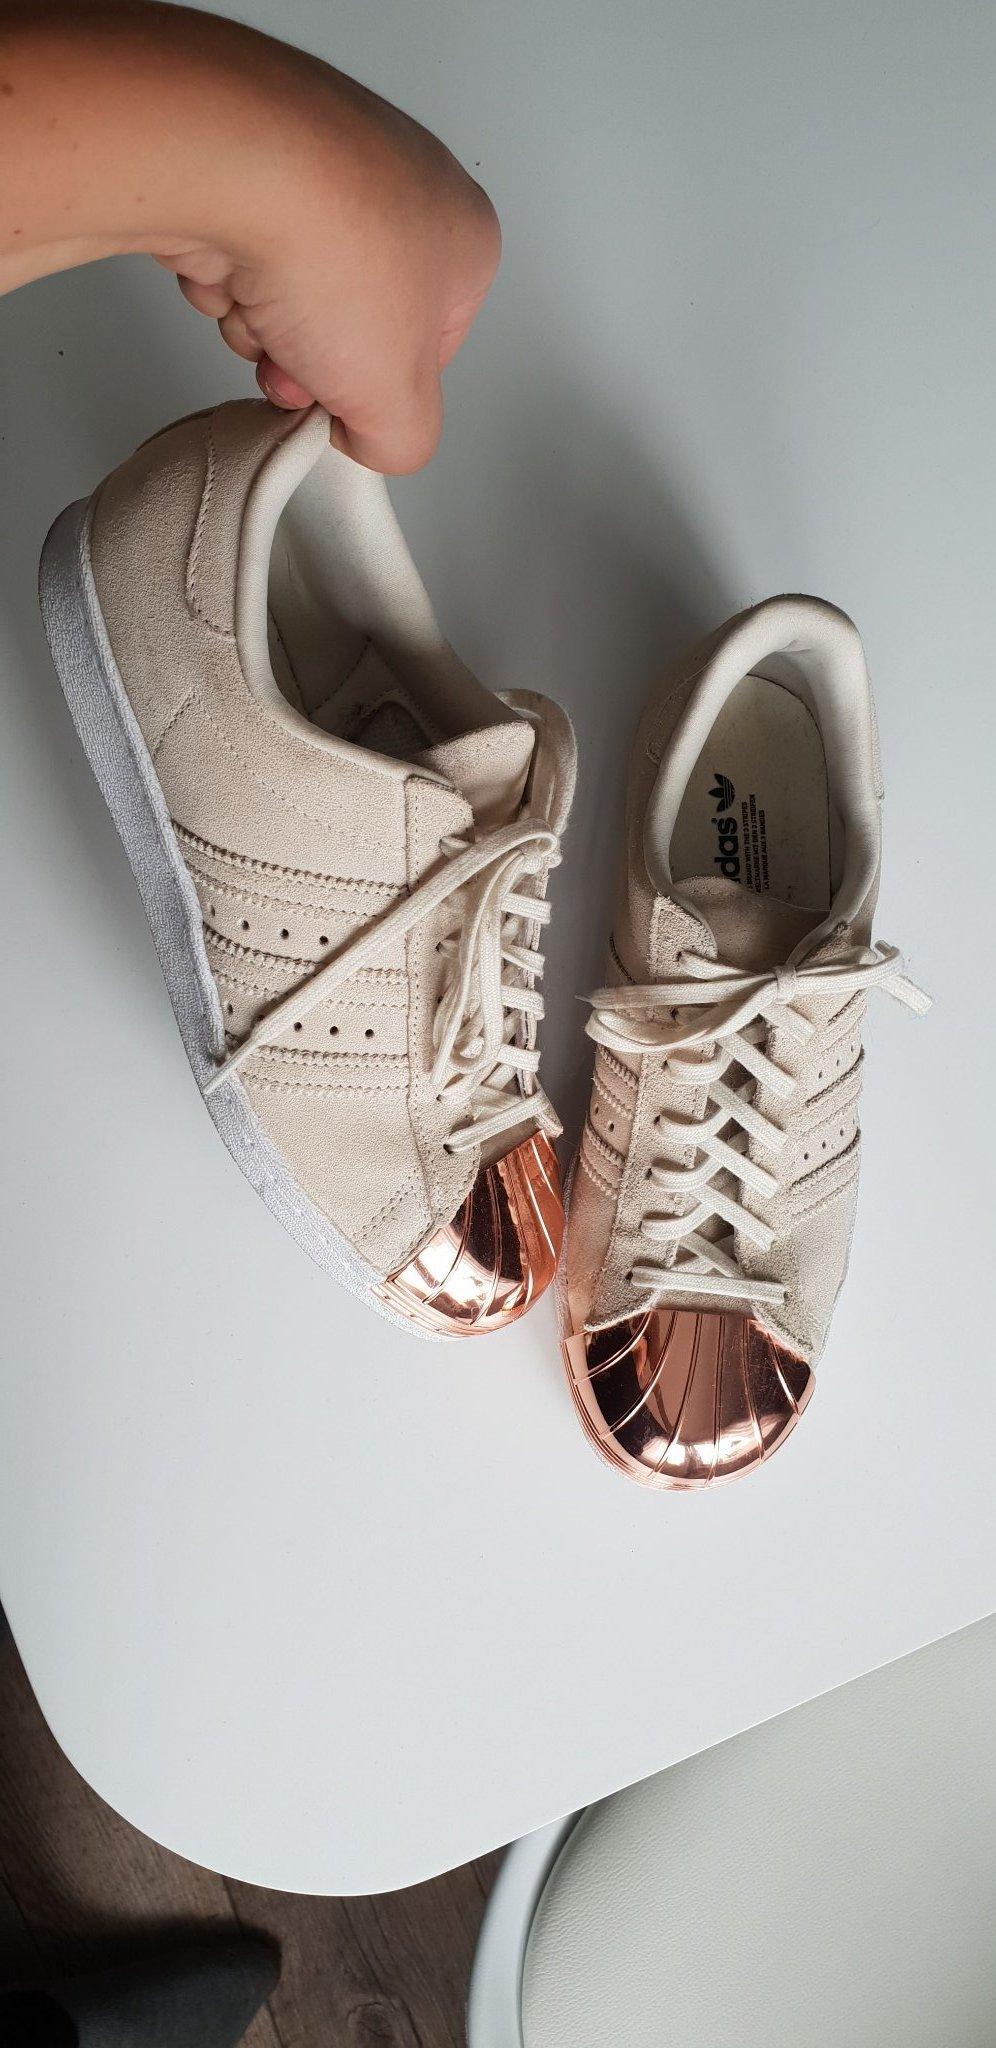 Adidas superstar metallic toe, rosé gold